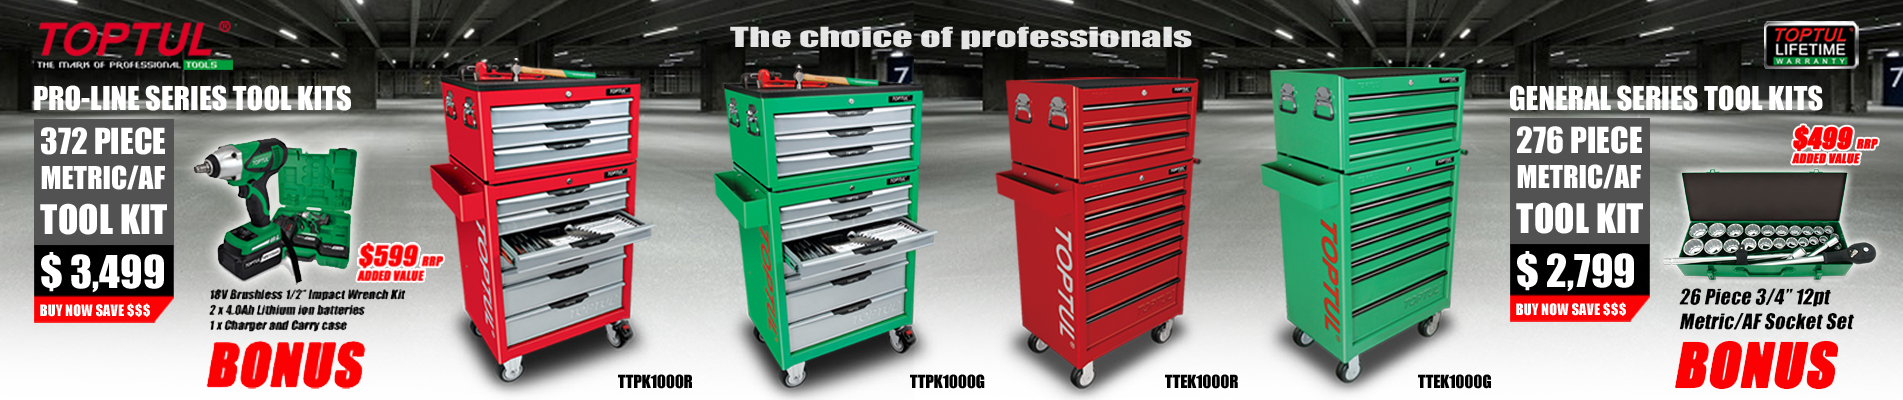 Tool Kits Mechanics Apprentice Tool Kits Toptul Audel Tools Dandenong